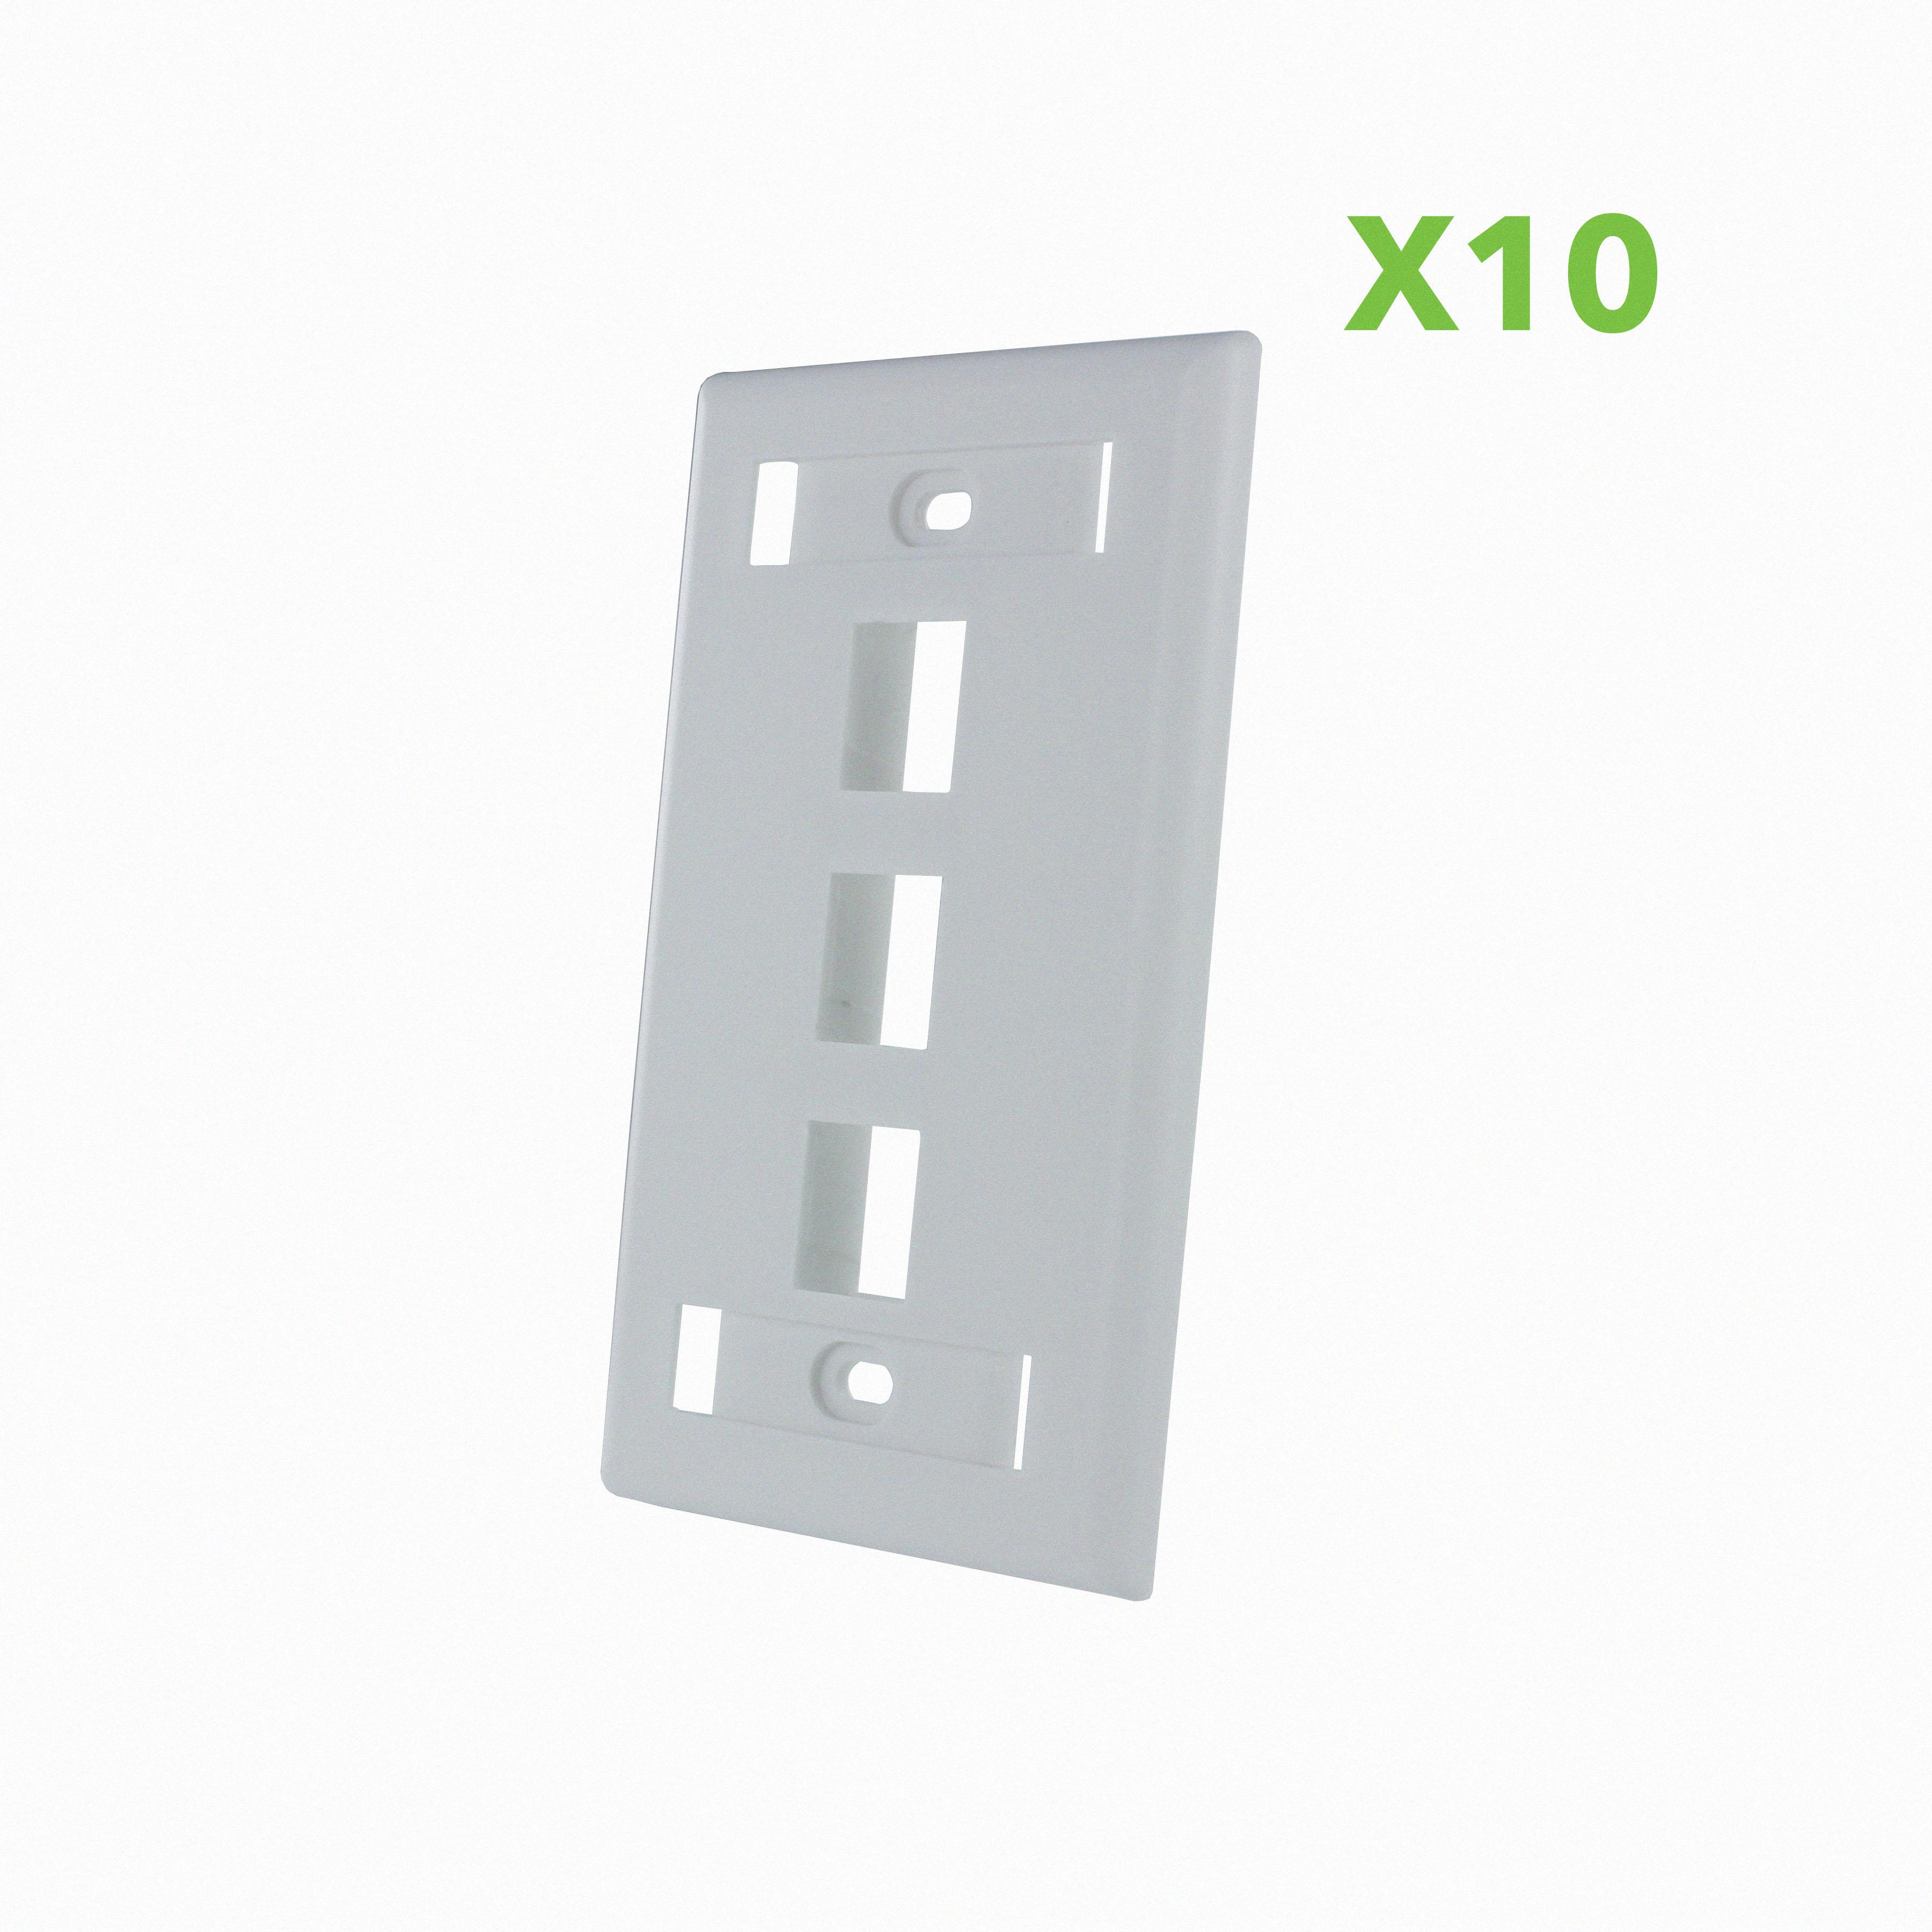 White 3 Port Decora RJ45 Network Keystone Wall Plate Insert 10 Pack